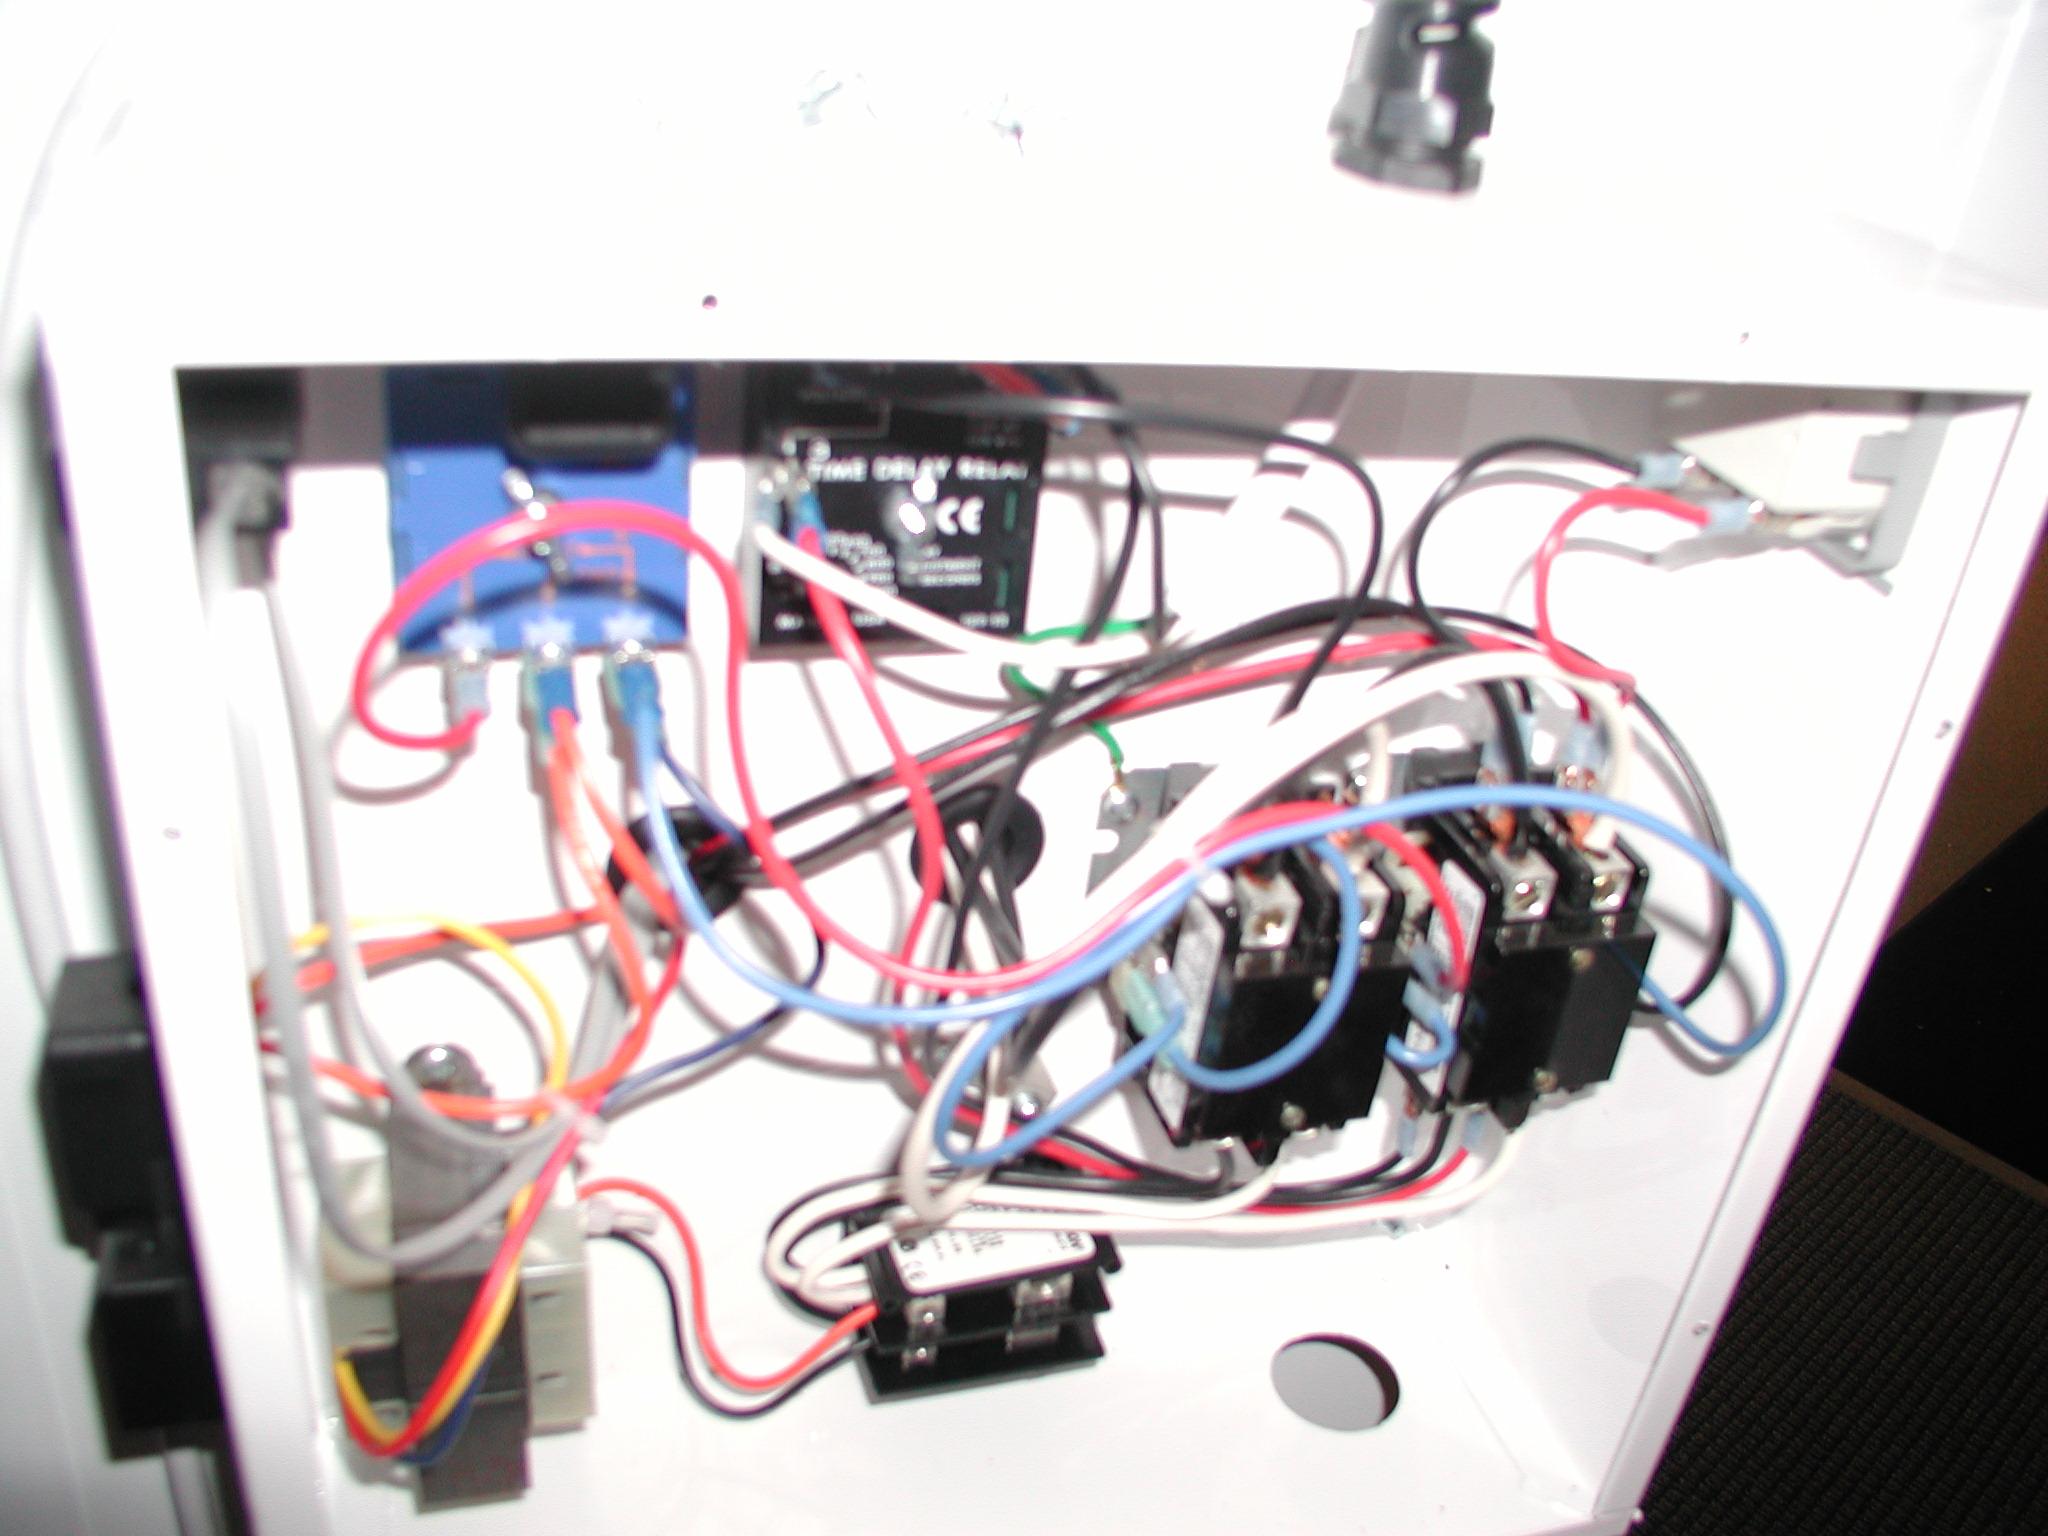 Repair Photos Tanning Bed Wiring 8